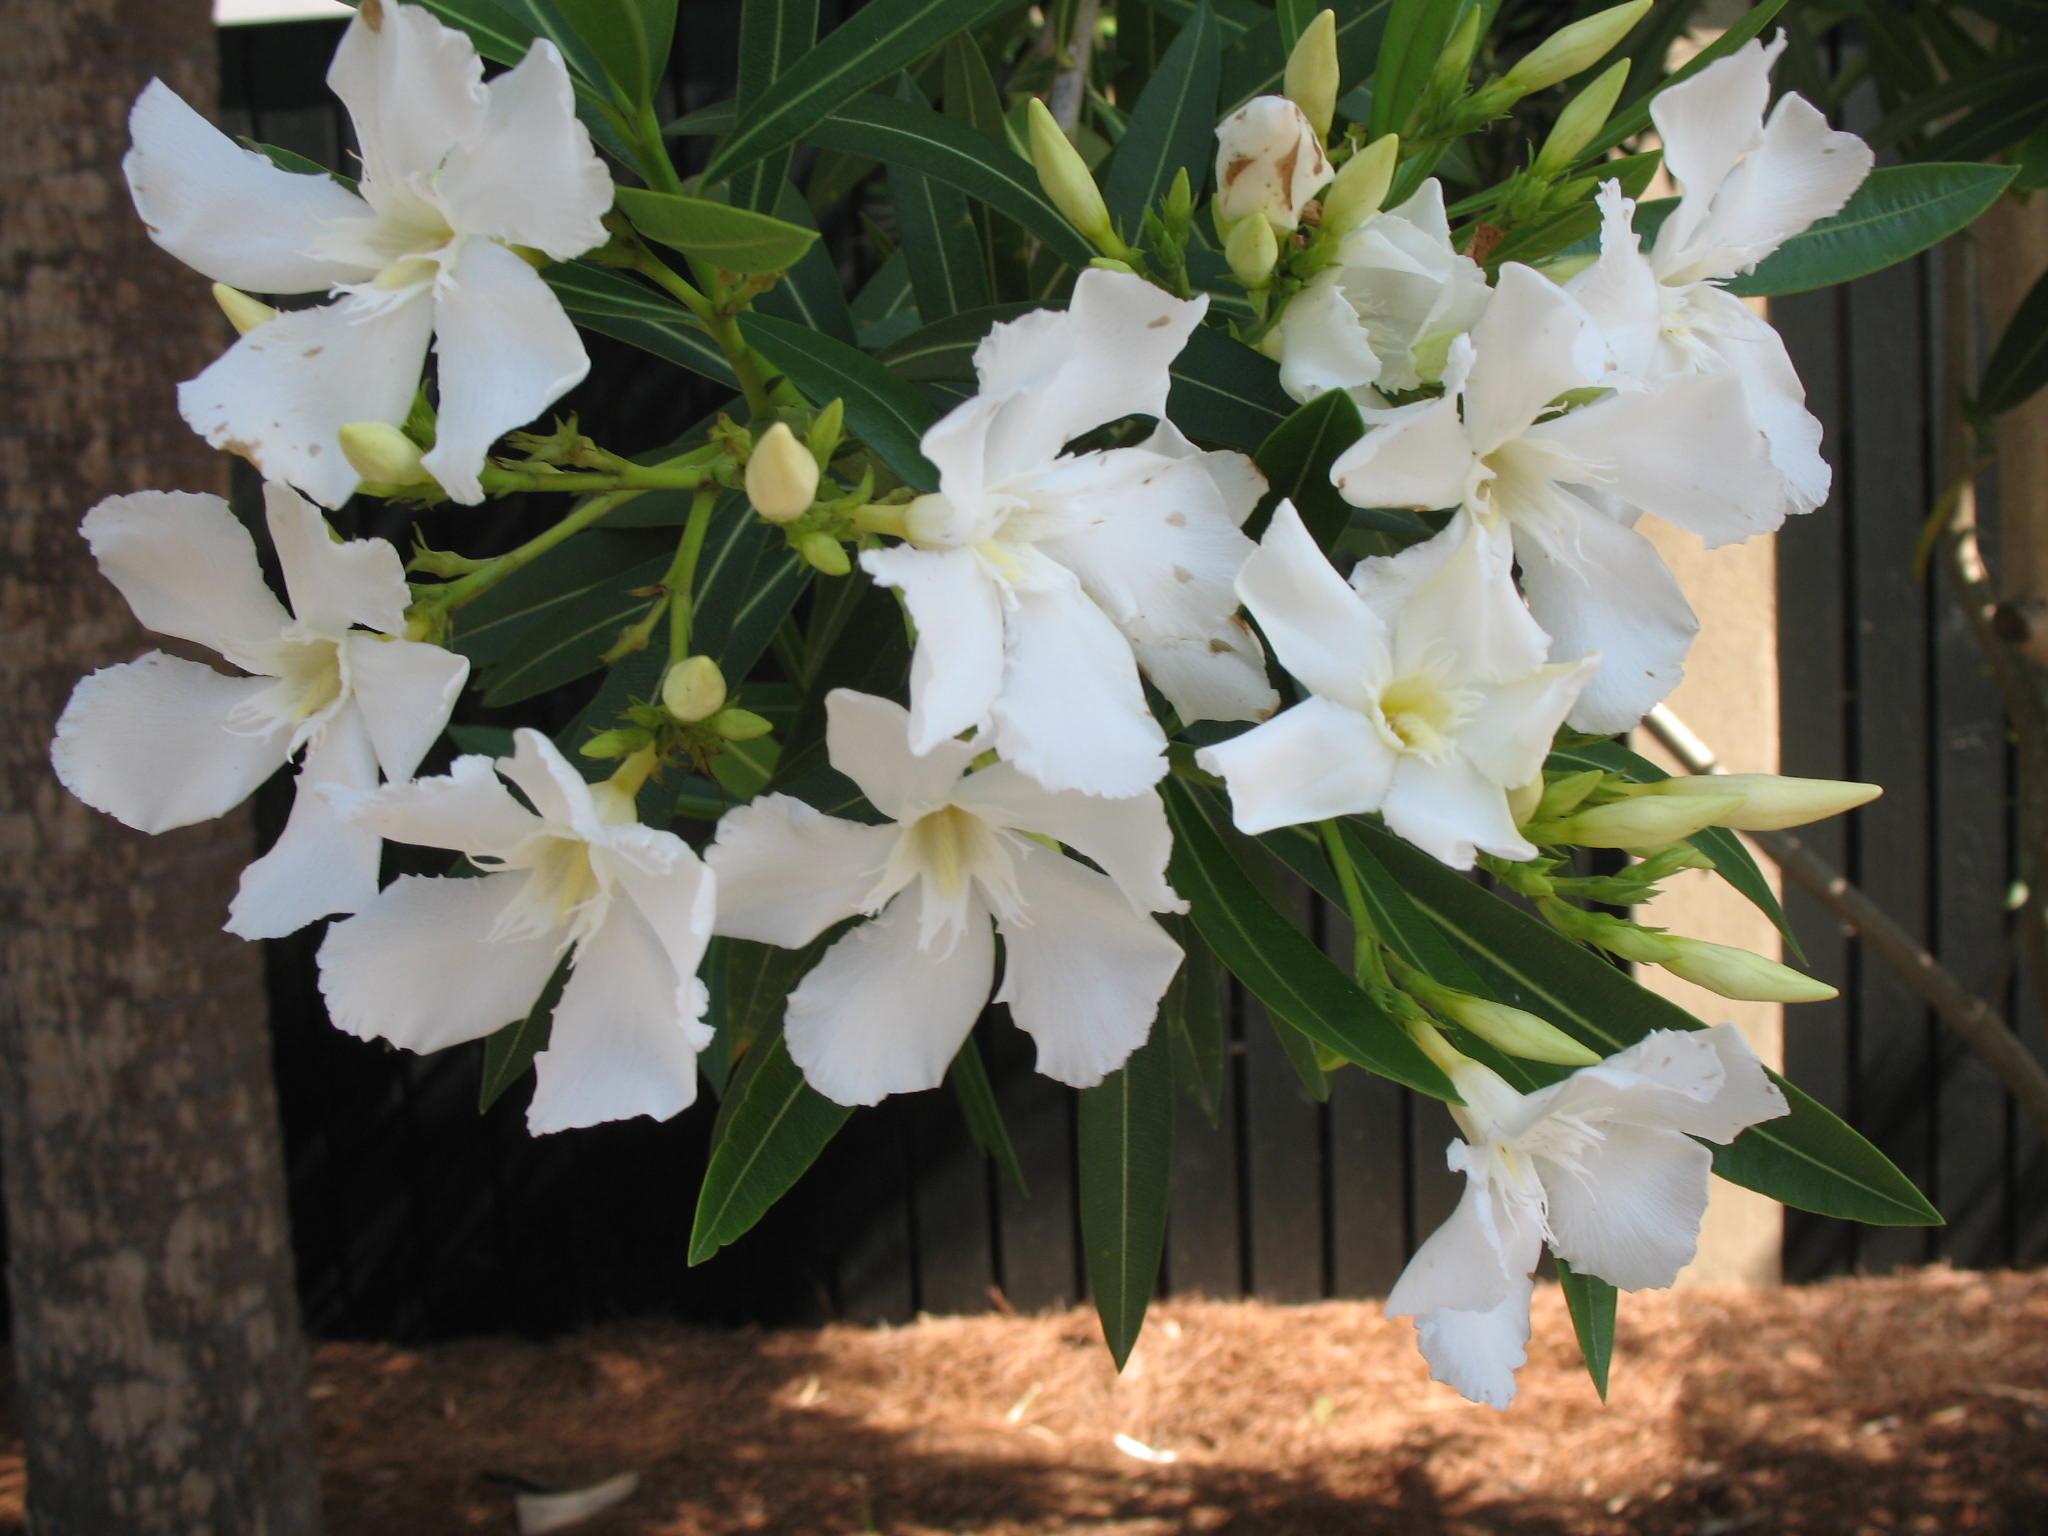 Nerium oleander 'Sister Agnes'  / Nerium oleander 'Sister Agnes'